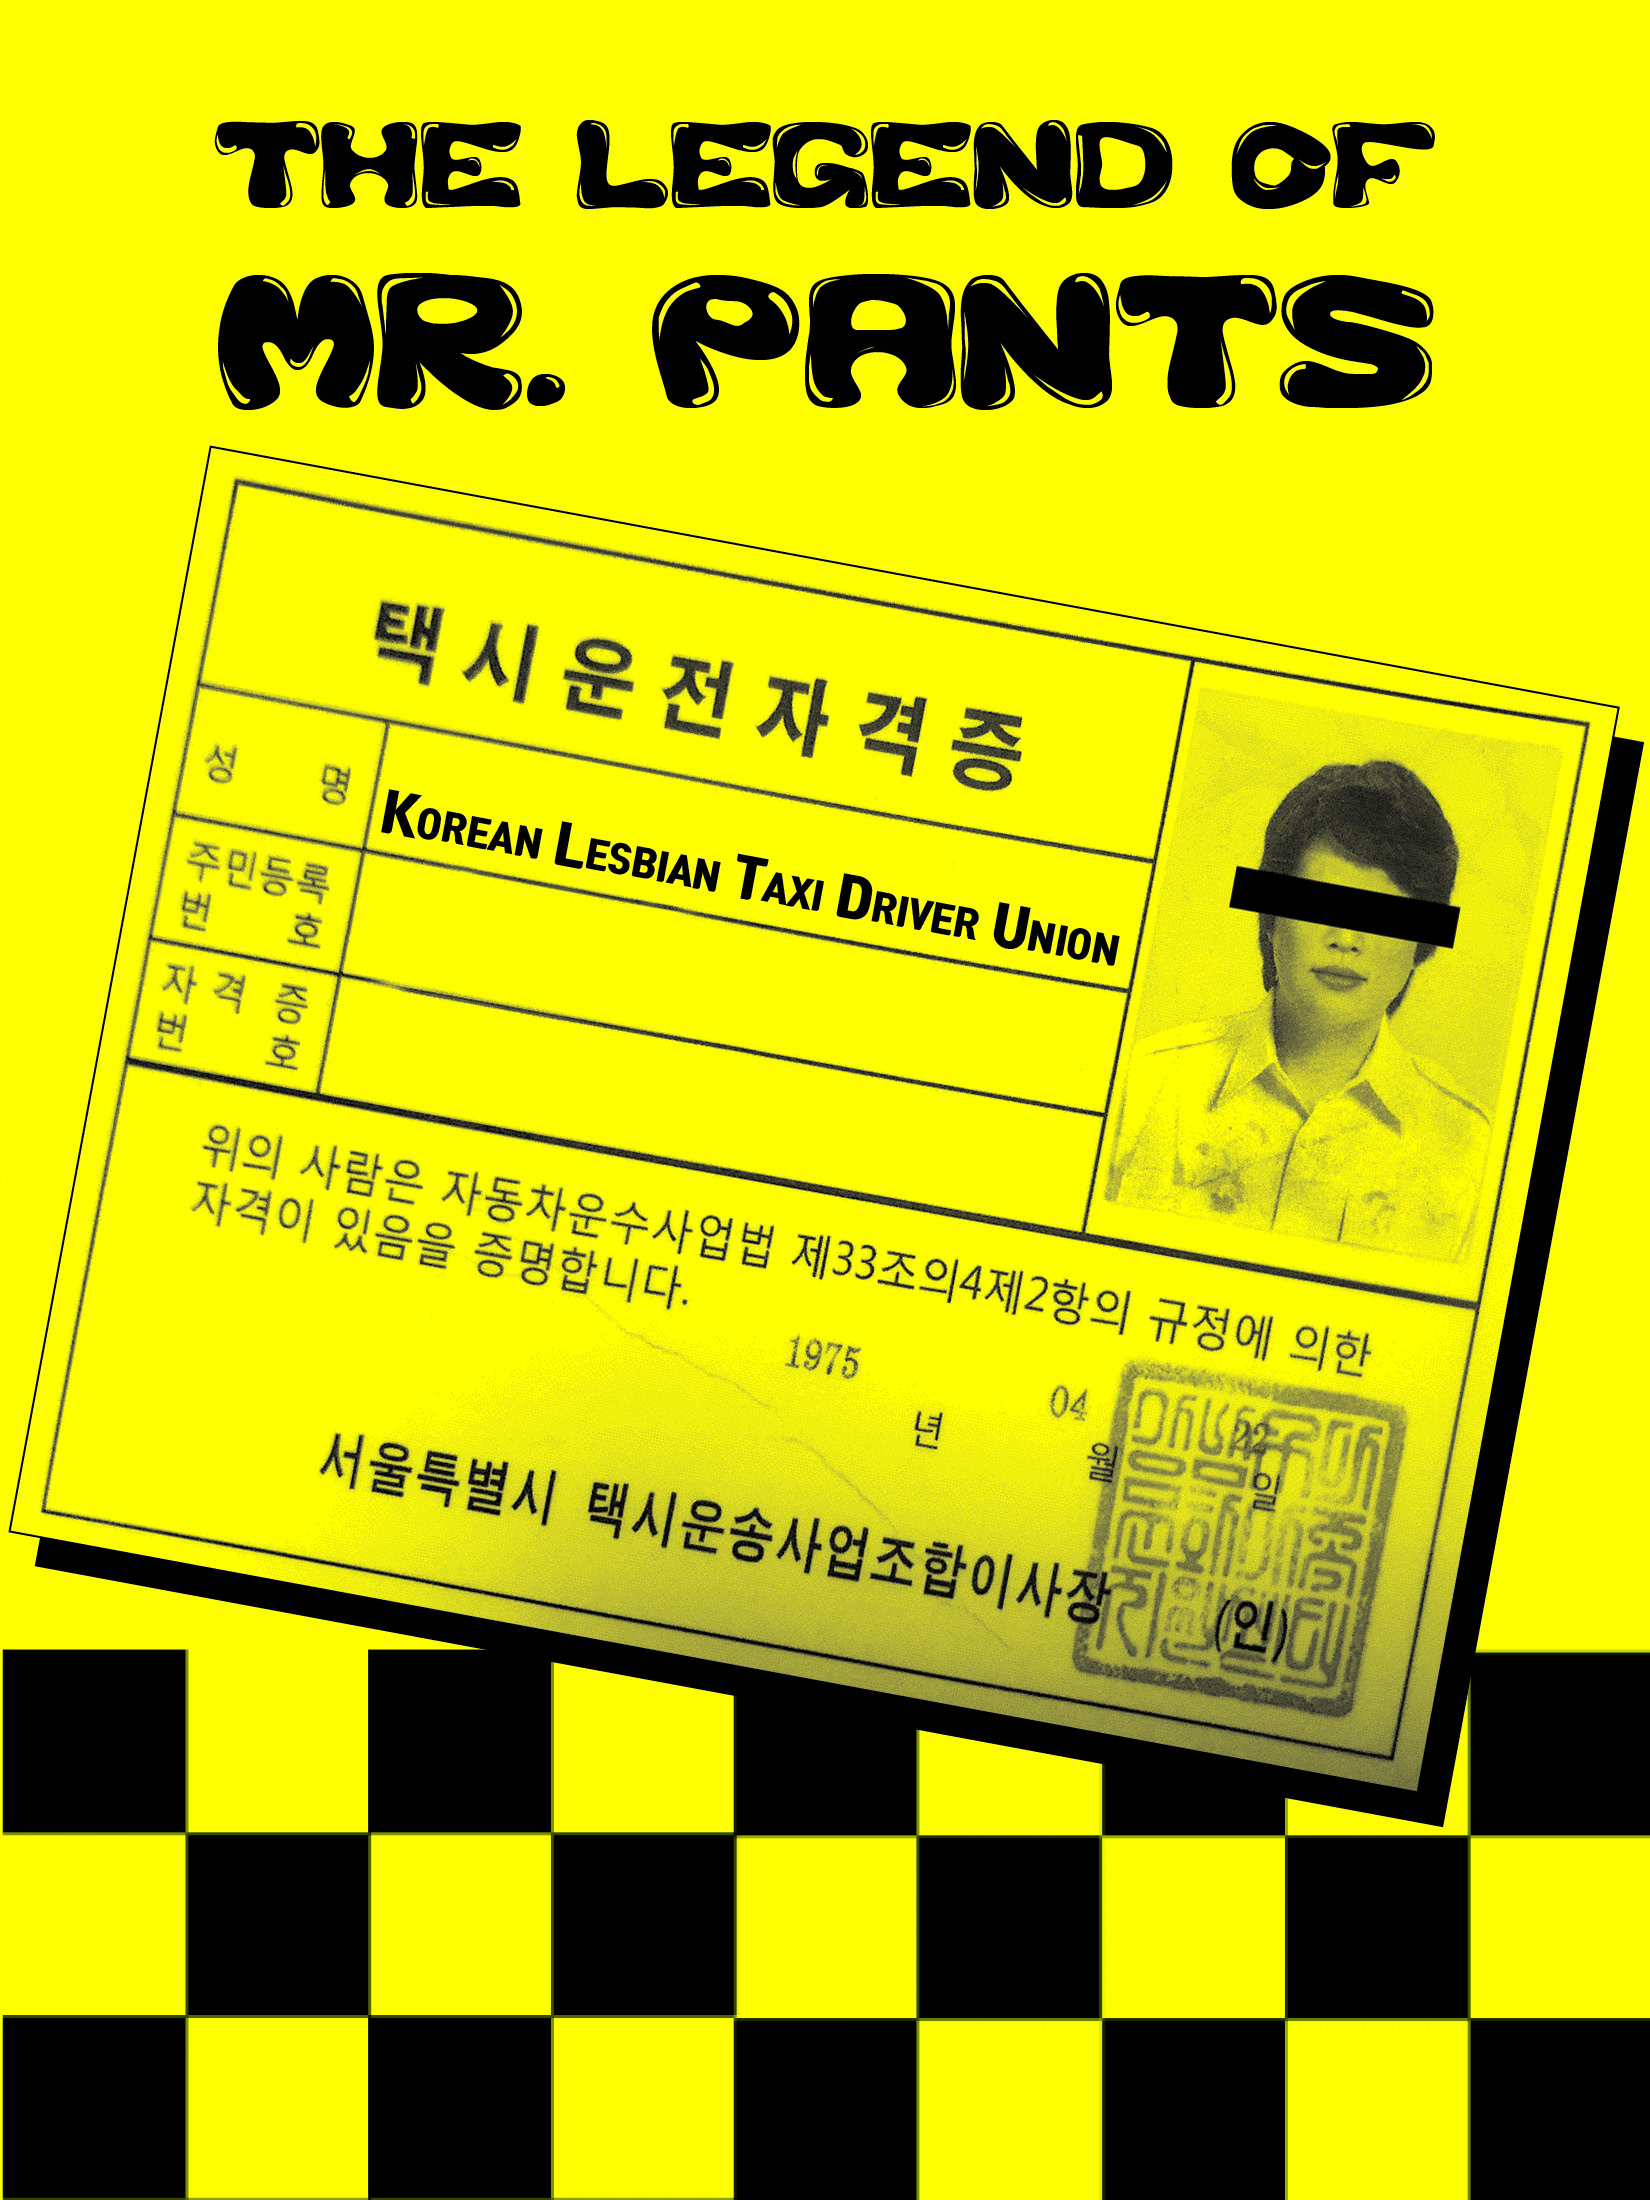 Legend of Mr. Pants